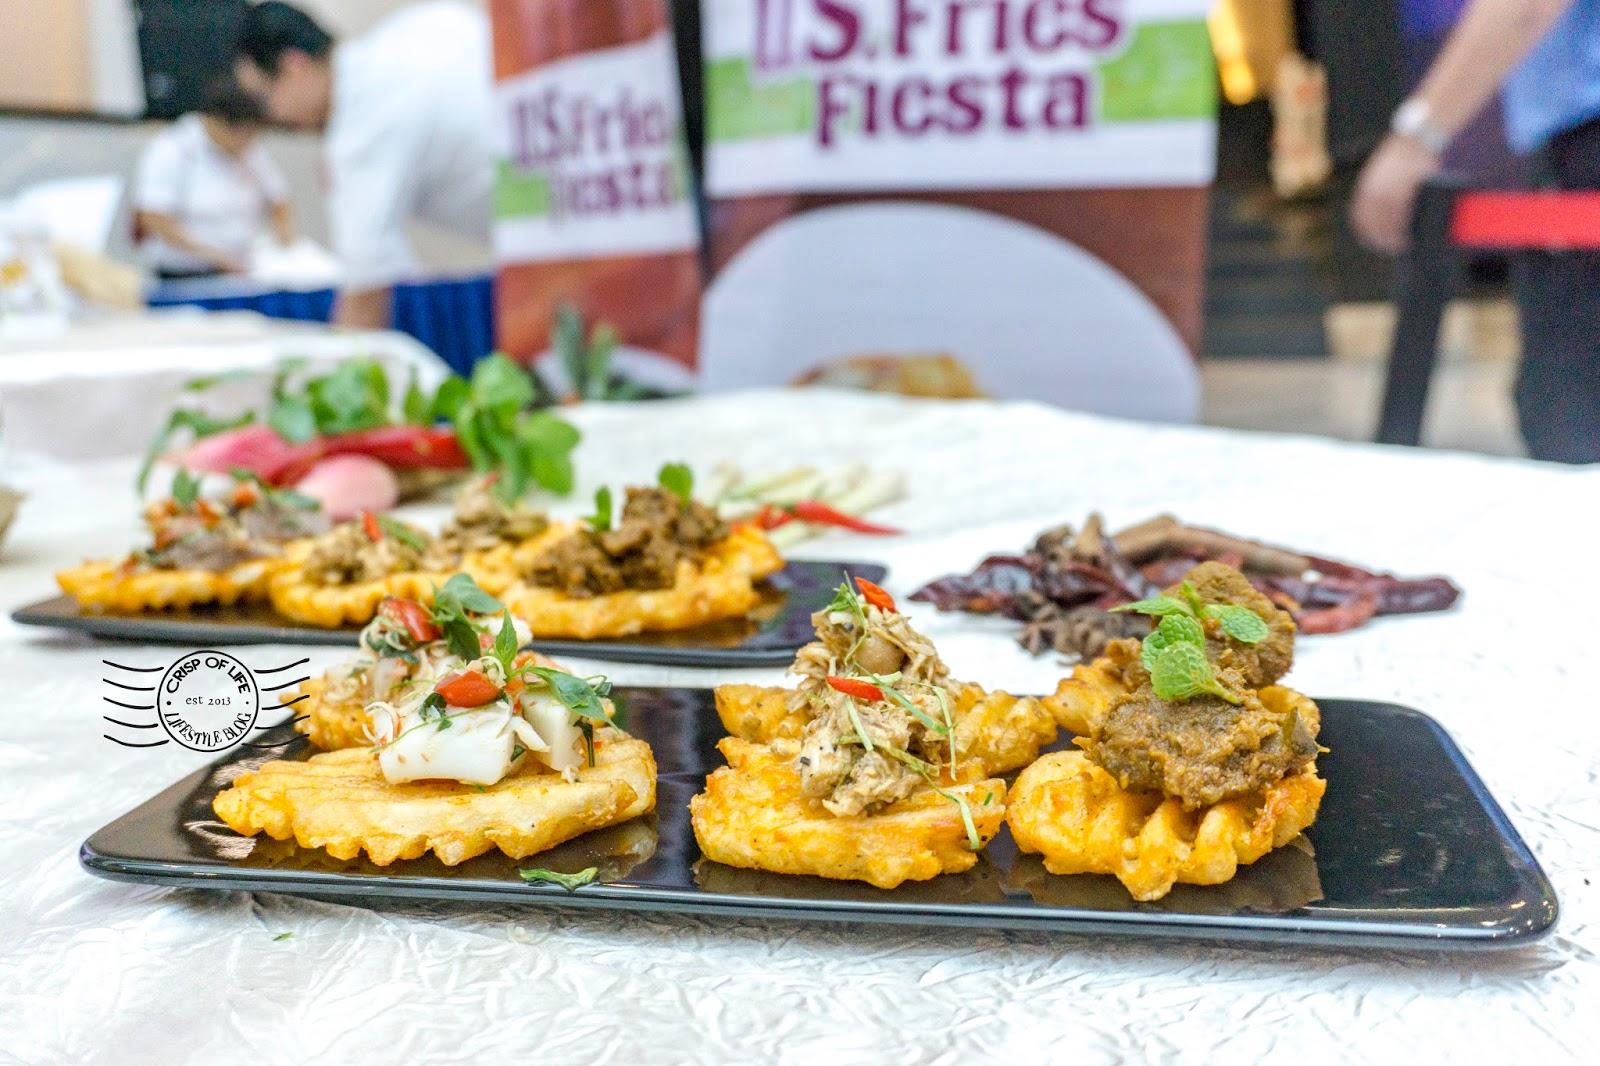 Potatoes Fries in Penang US Fries Fiesta Penang 2017